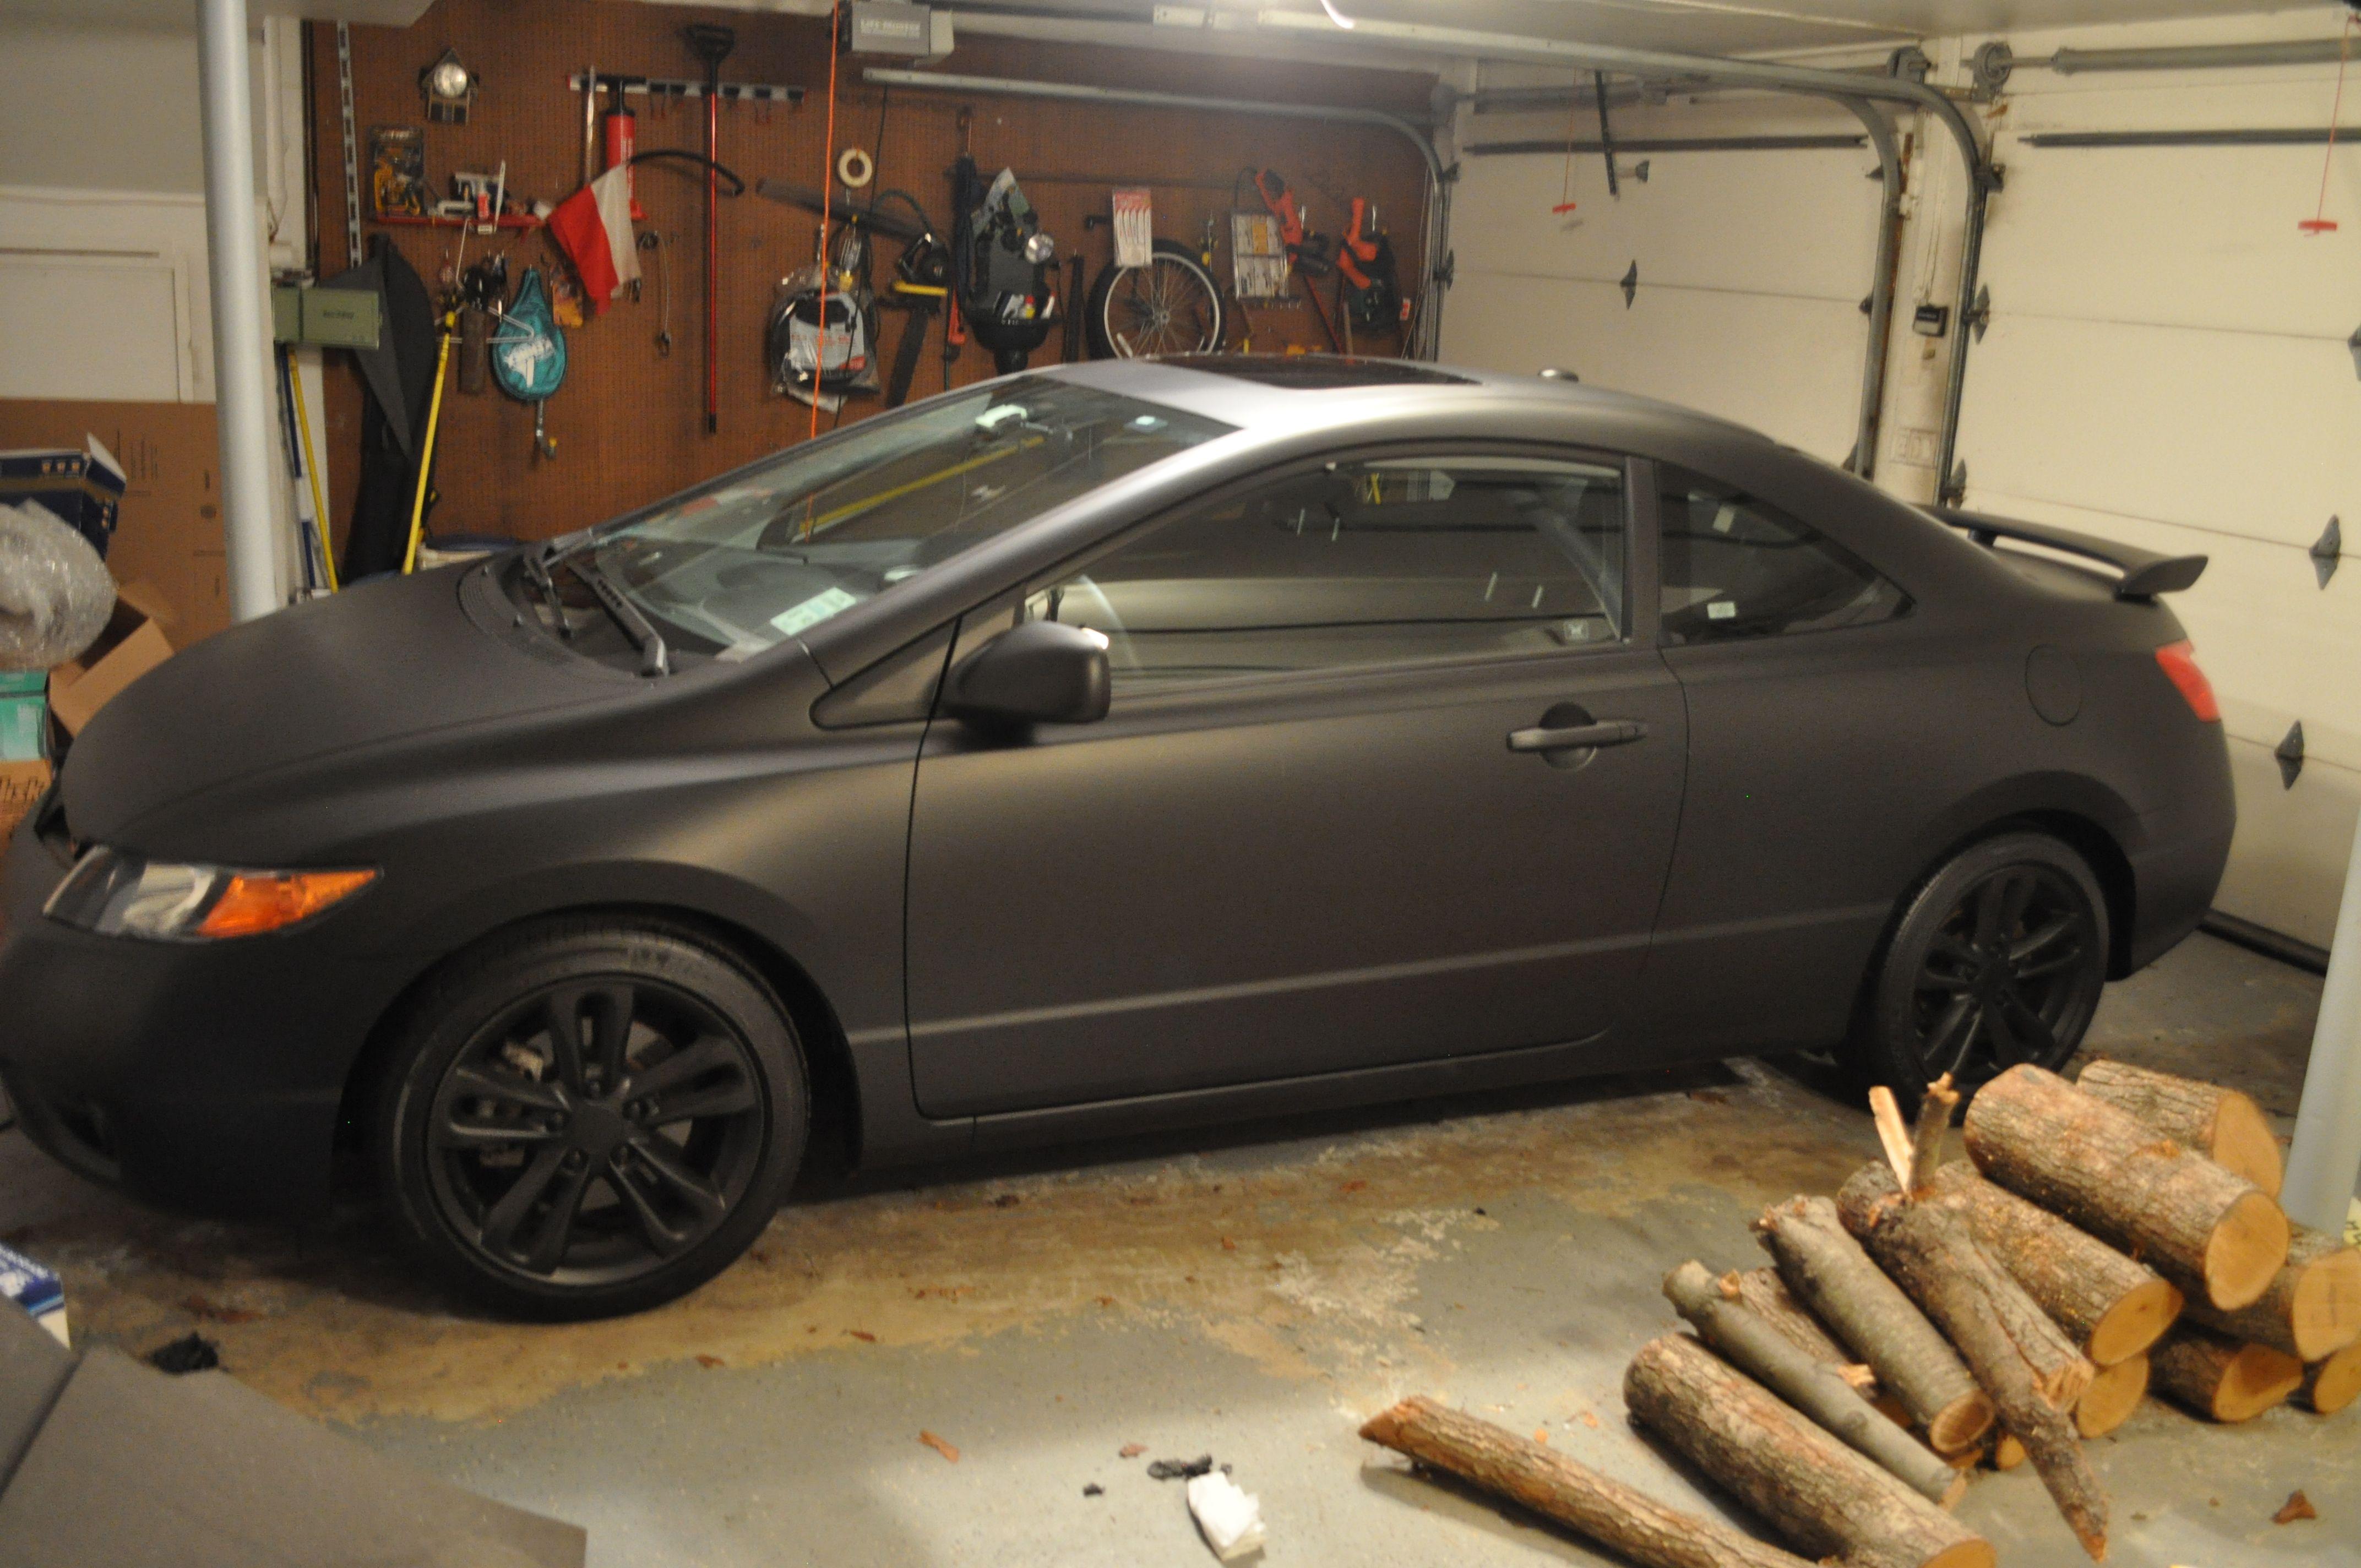 Matte Black Vinyl Wrap Honda Civic Google Search Black Honda Honda Civic Honda Civic 2012